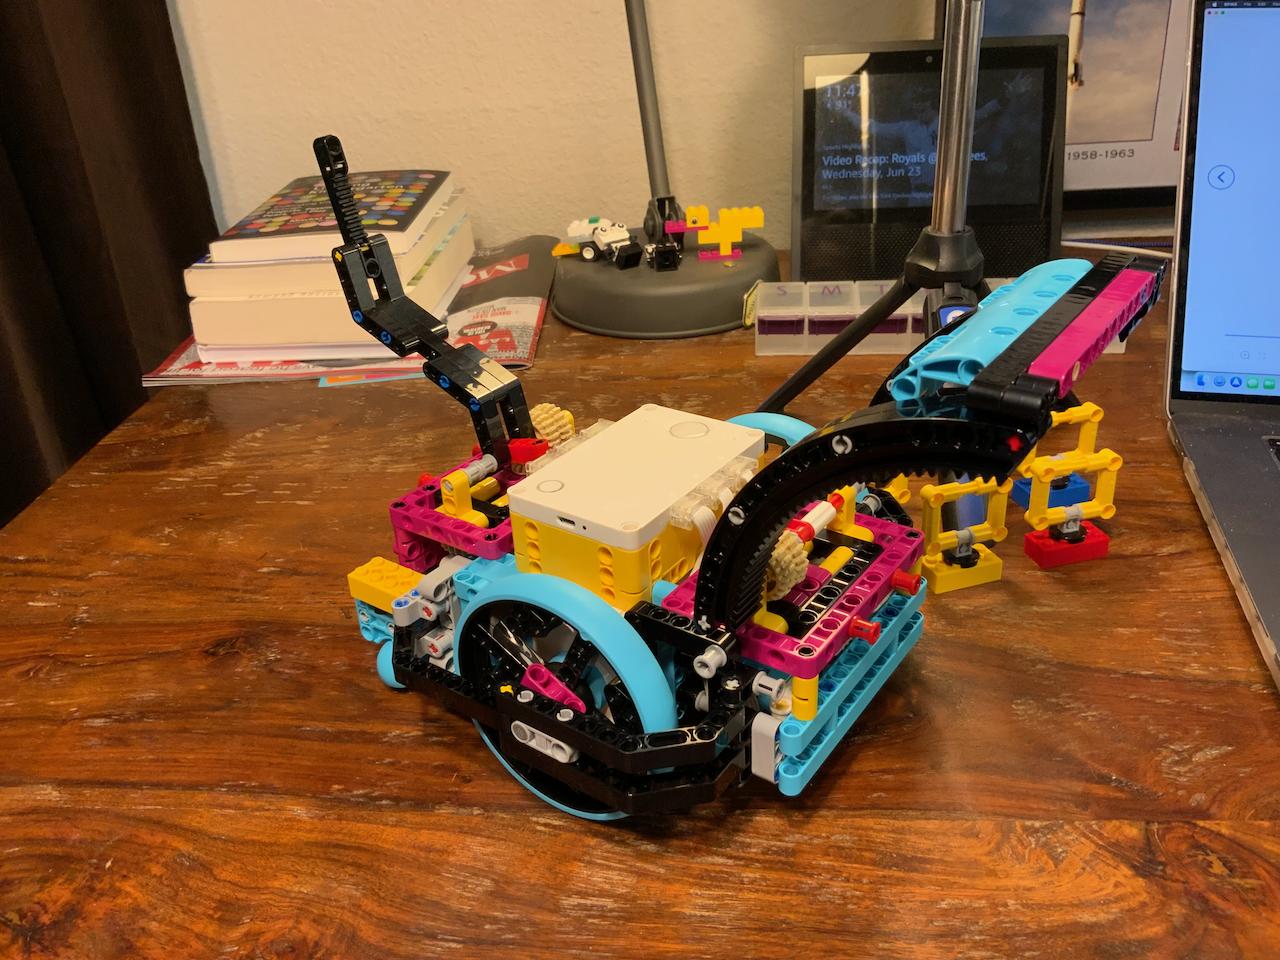 2021-06-24 LEGO Spike Prime Turtle robot